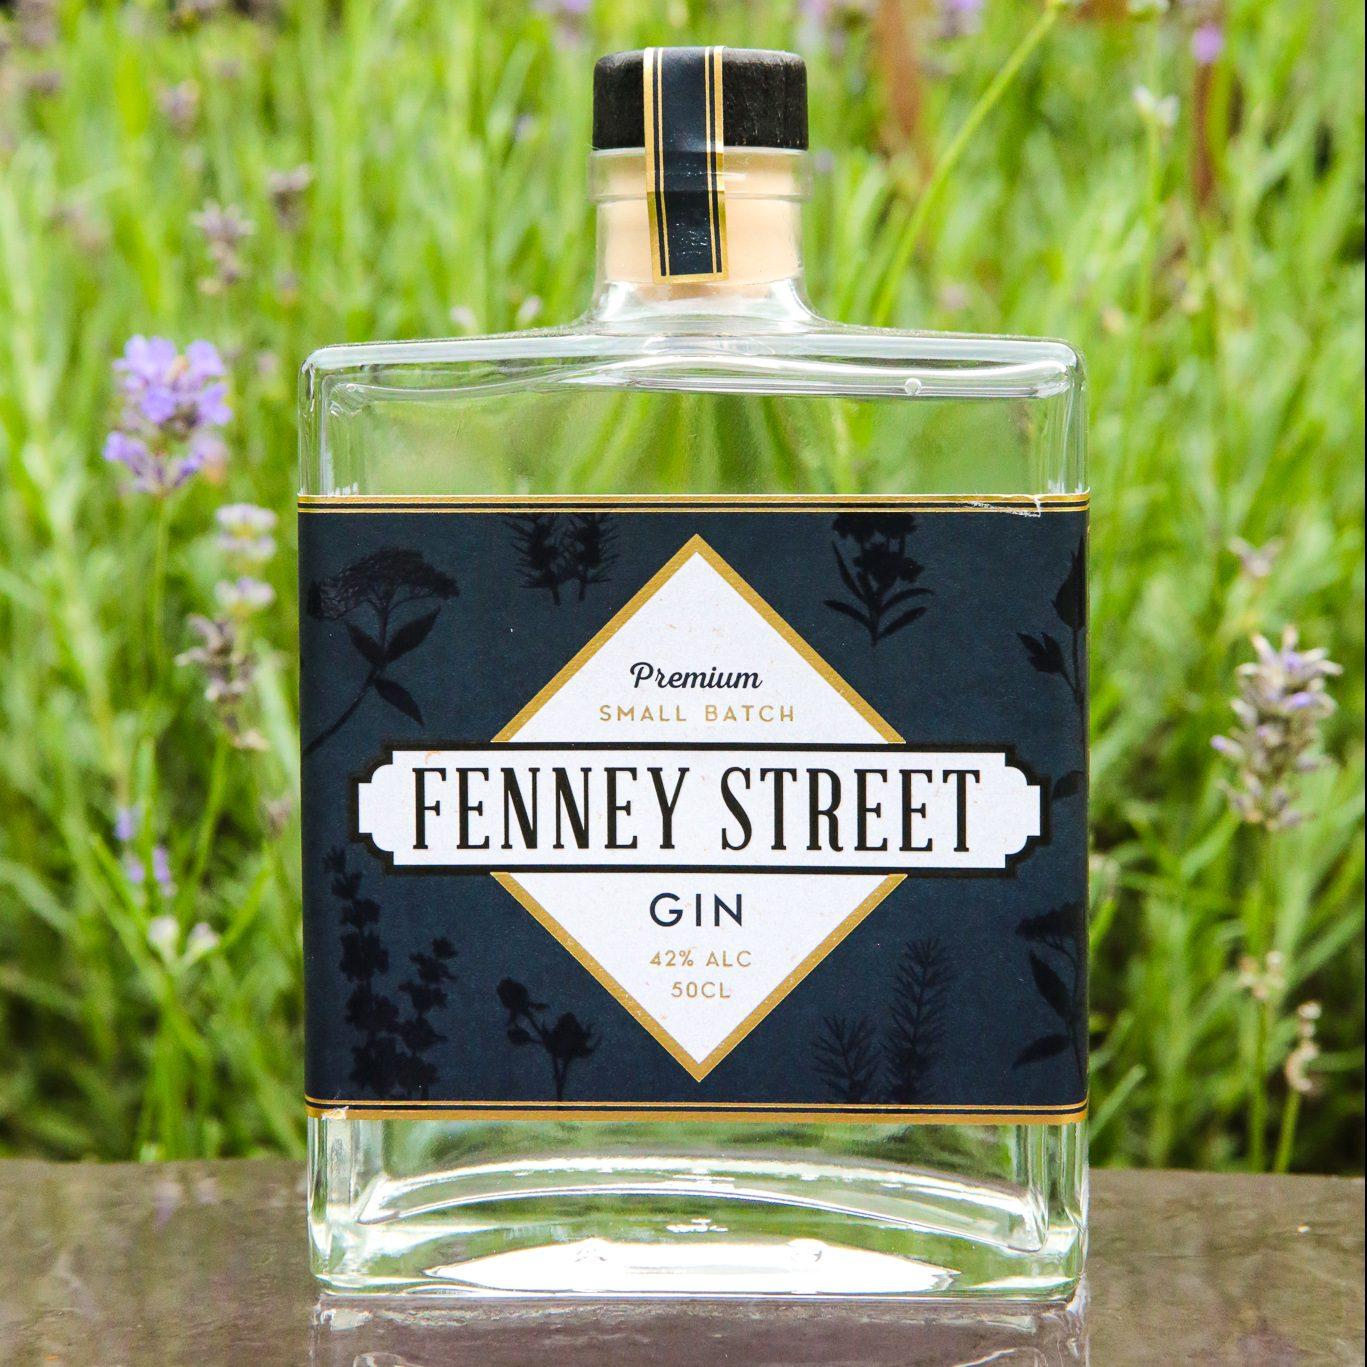 Fenney Street